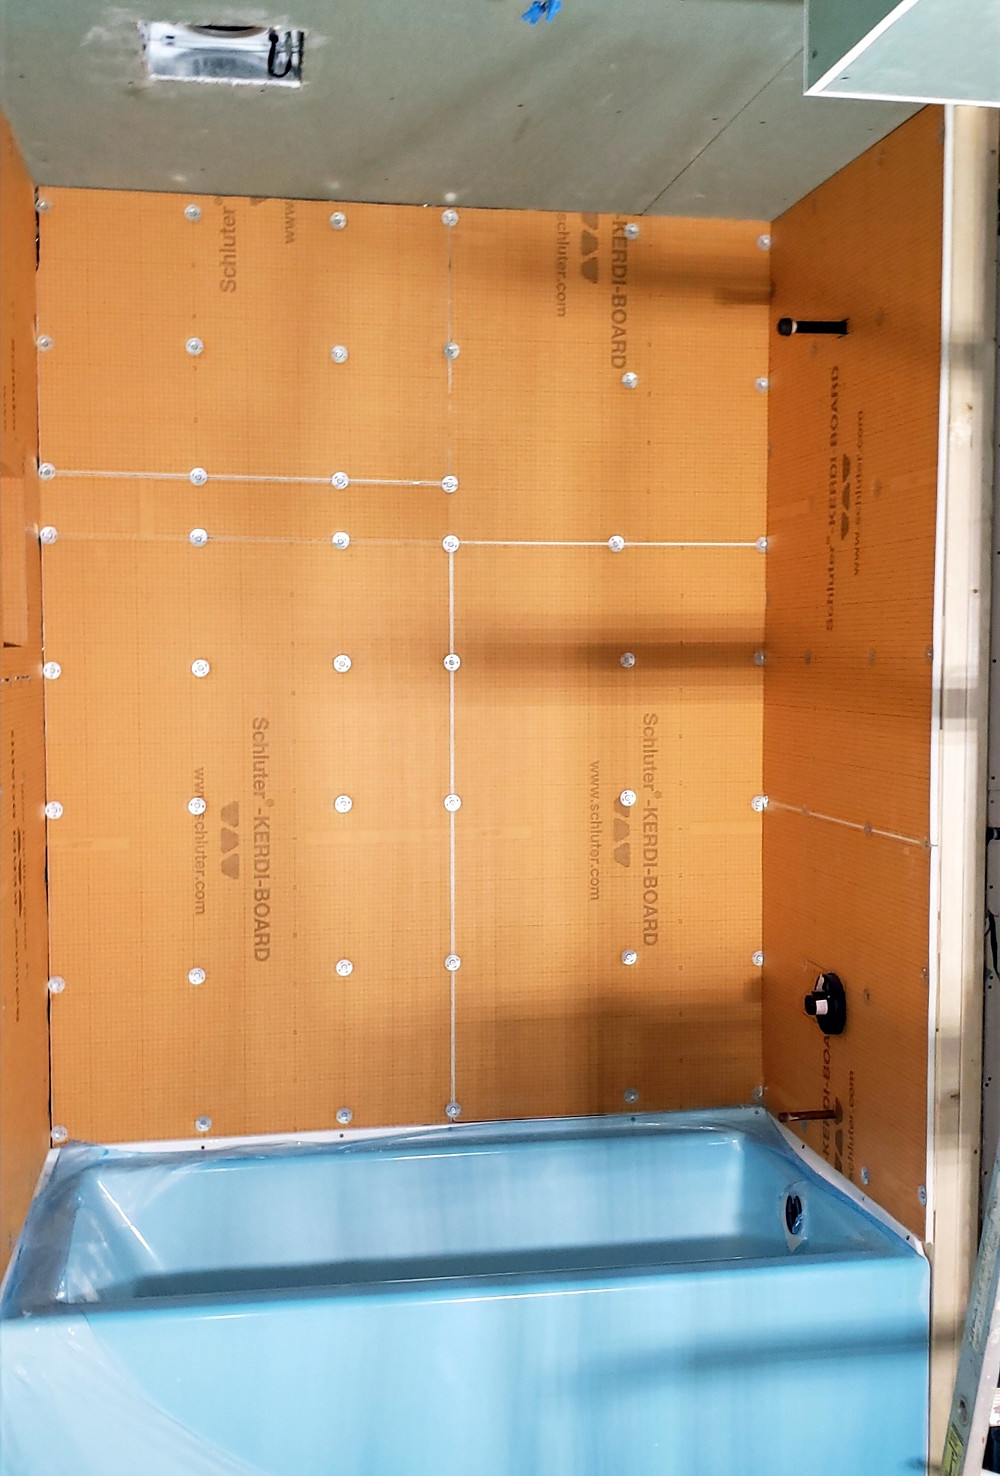 Tub surround with Kerdi-board | Schleuter-system | basement bathroom